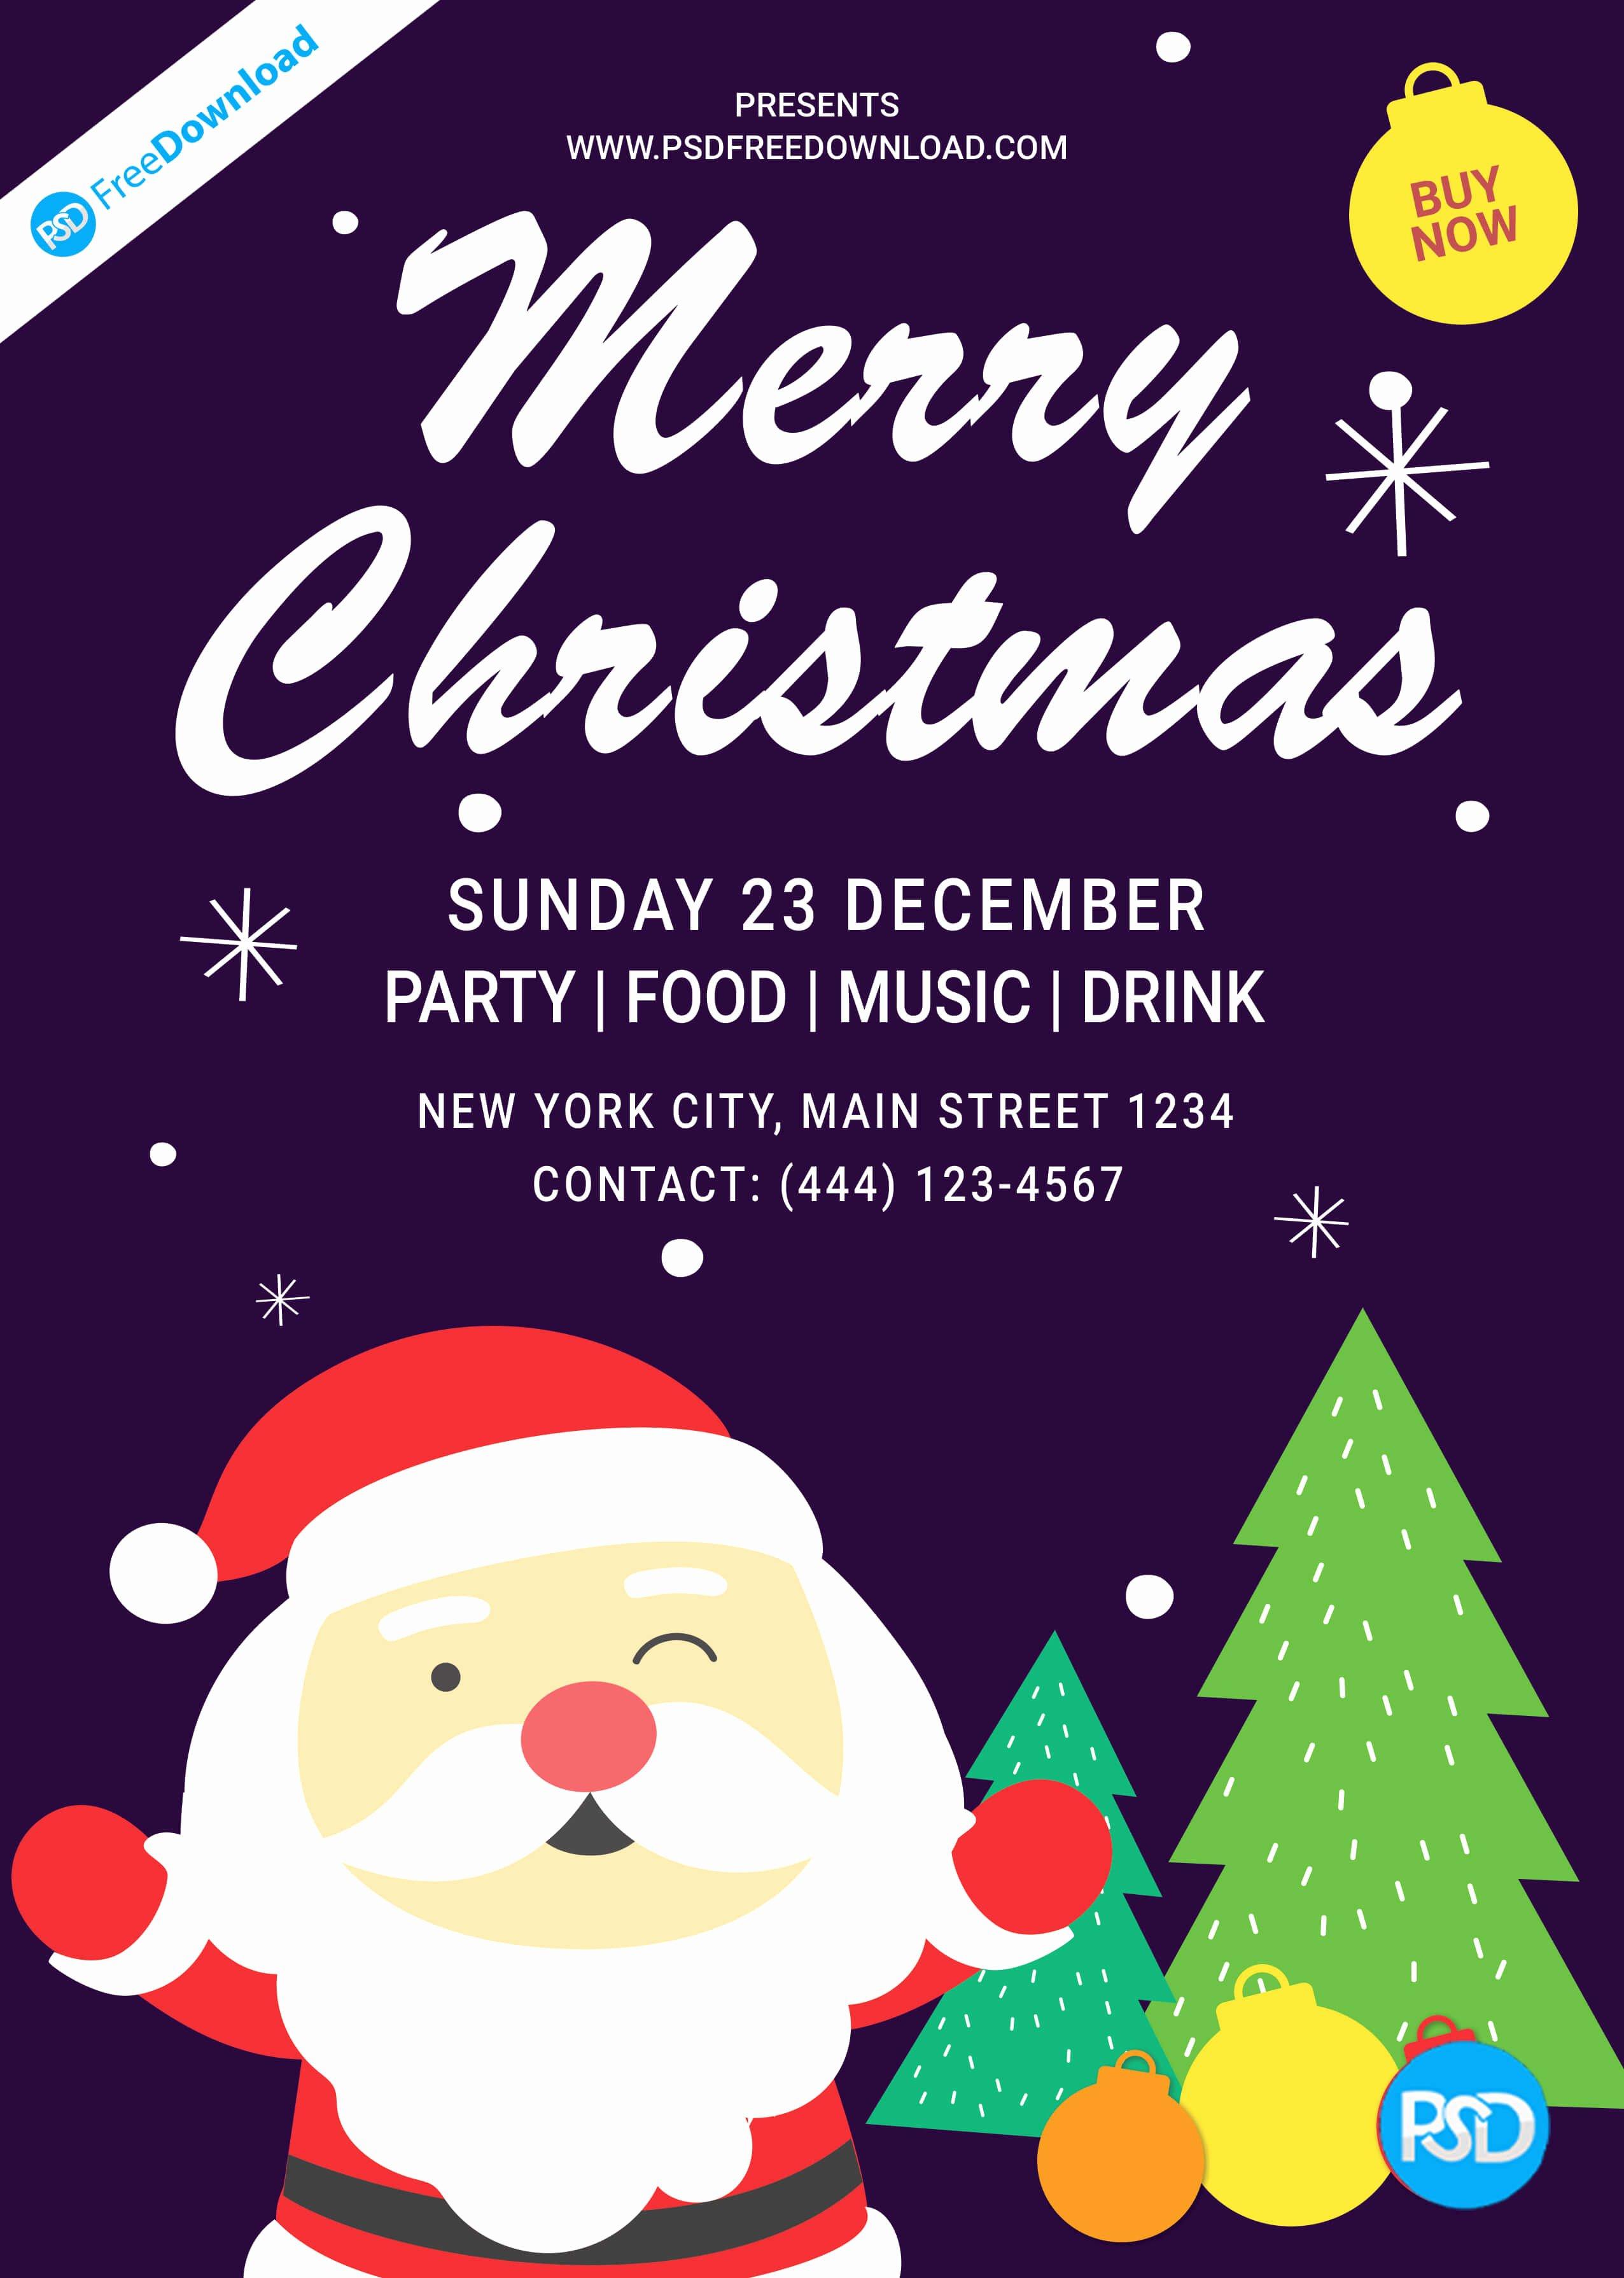 Free Christmas Flyer Templates Unique Christmas Flyer Template Design